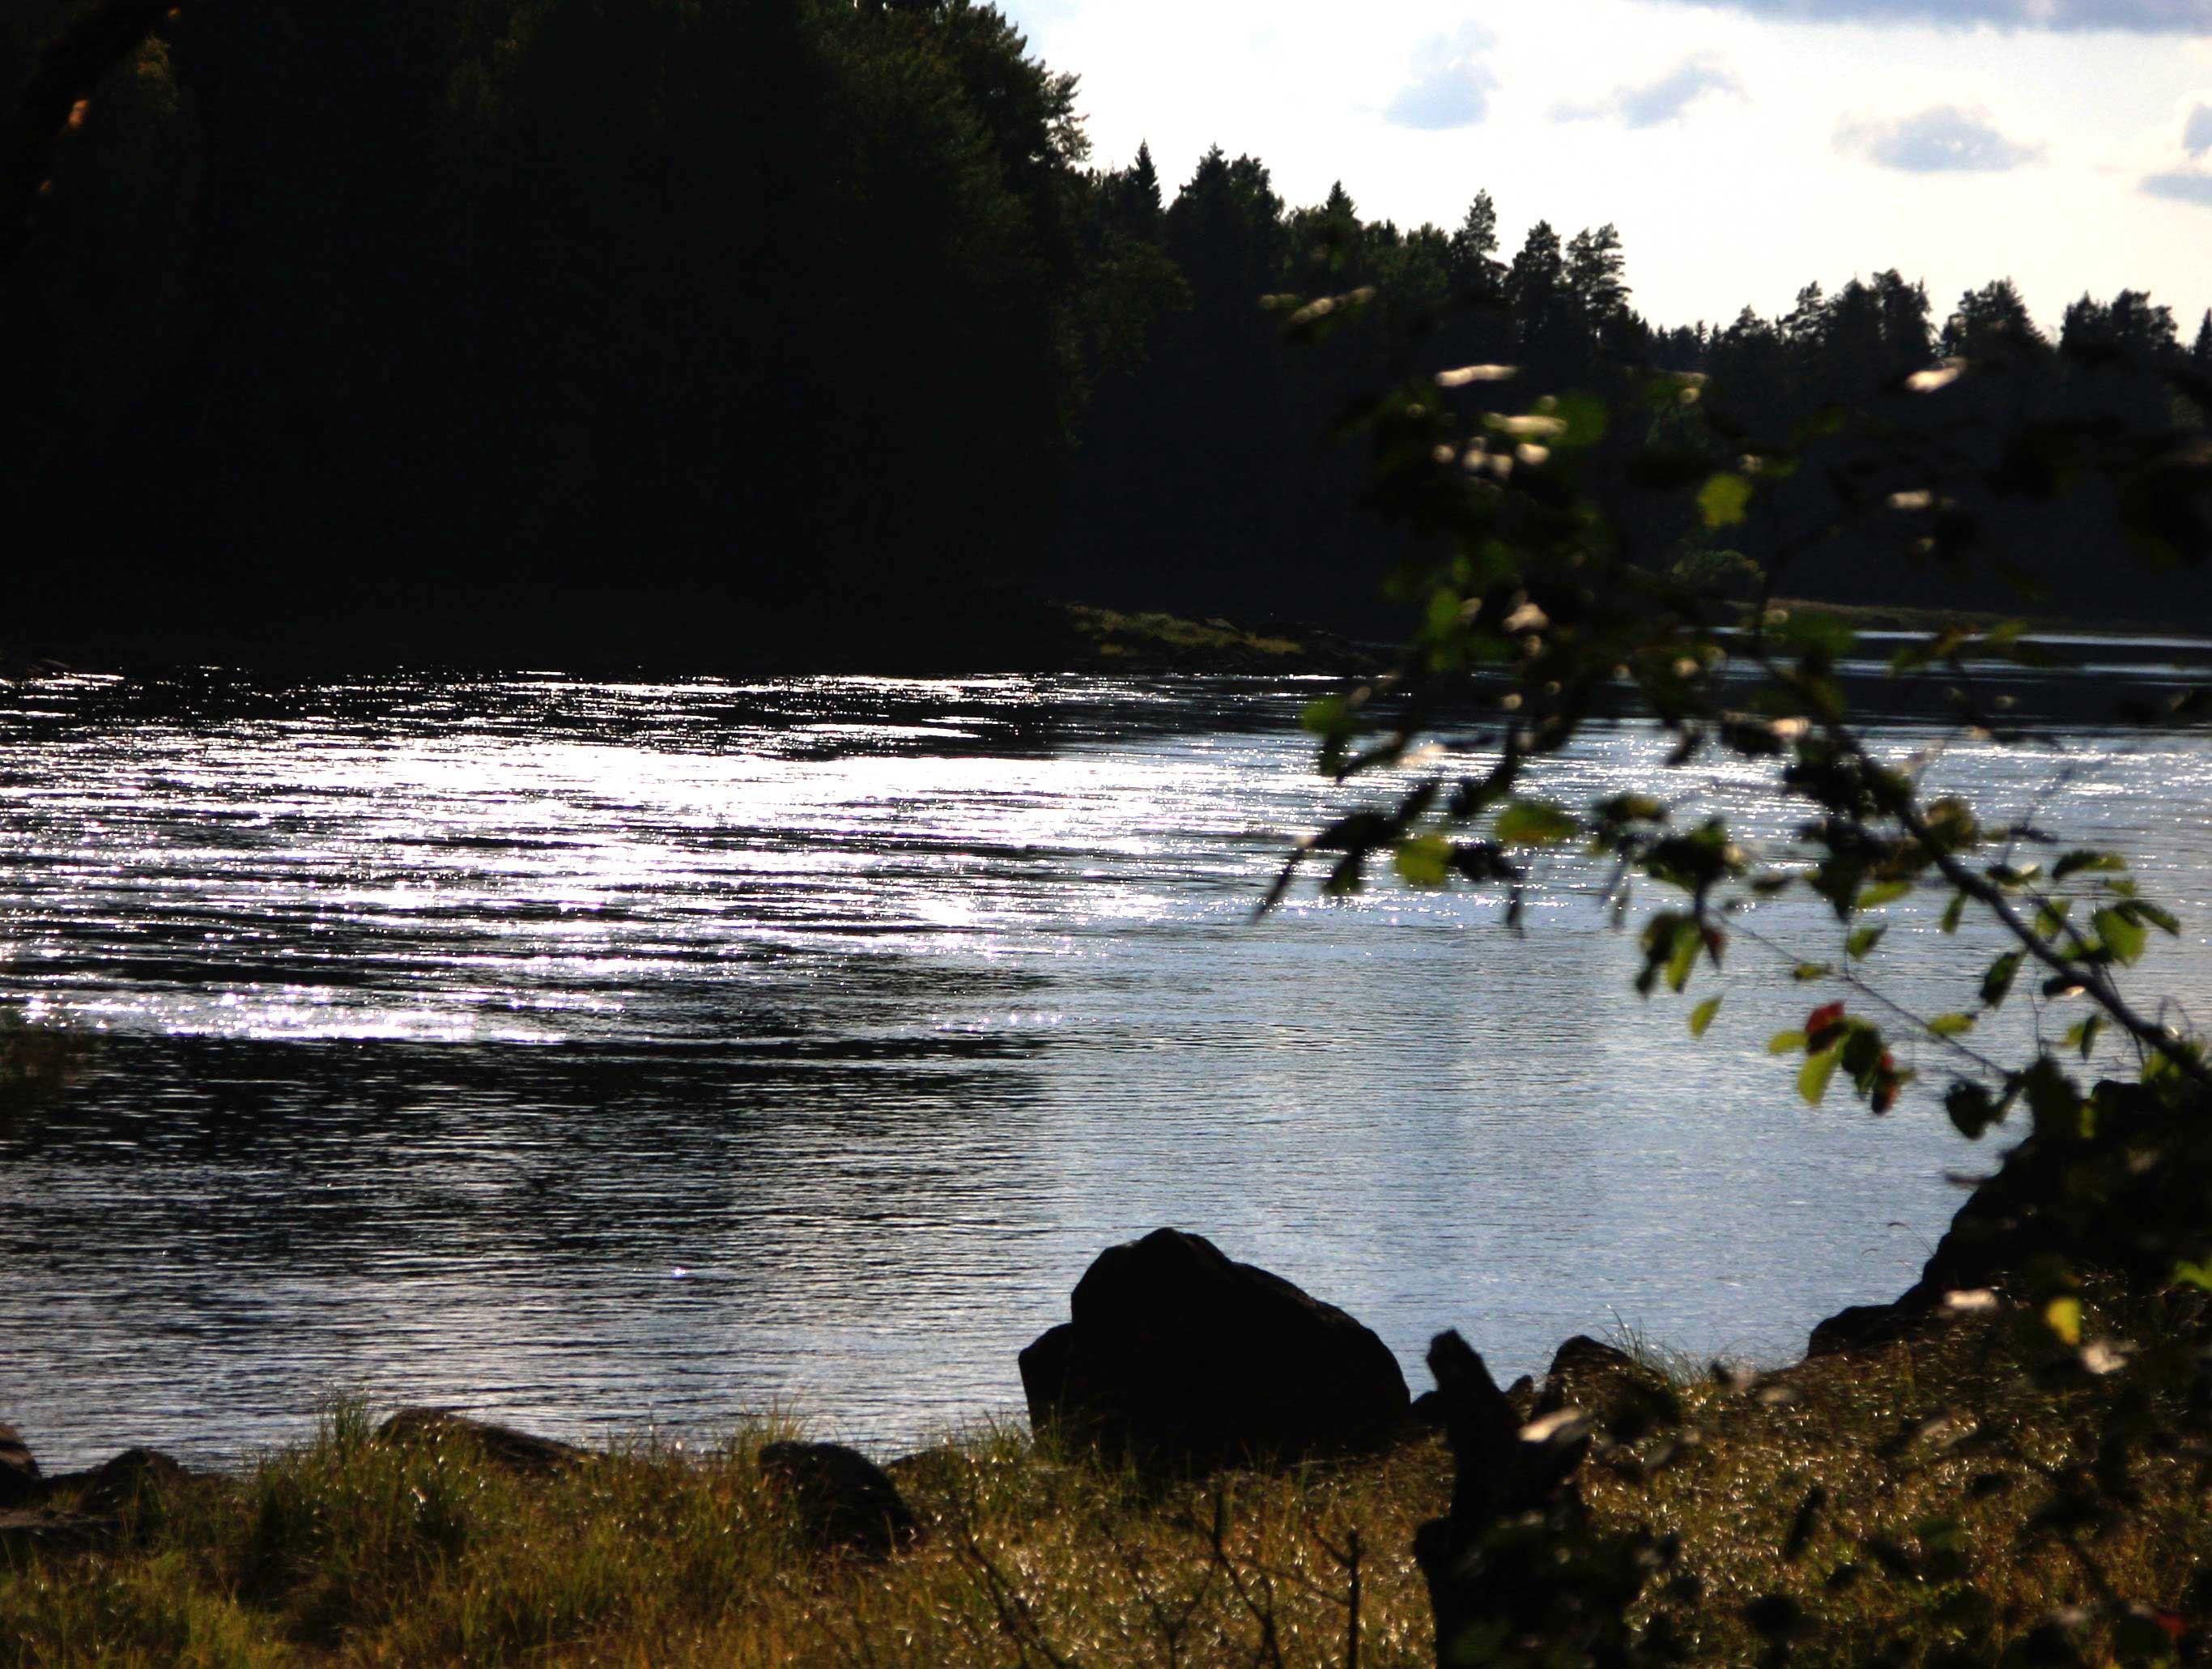 Tyttbo Forsfiske